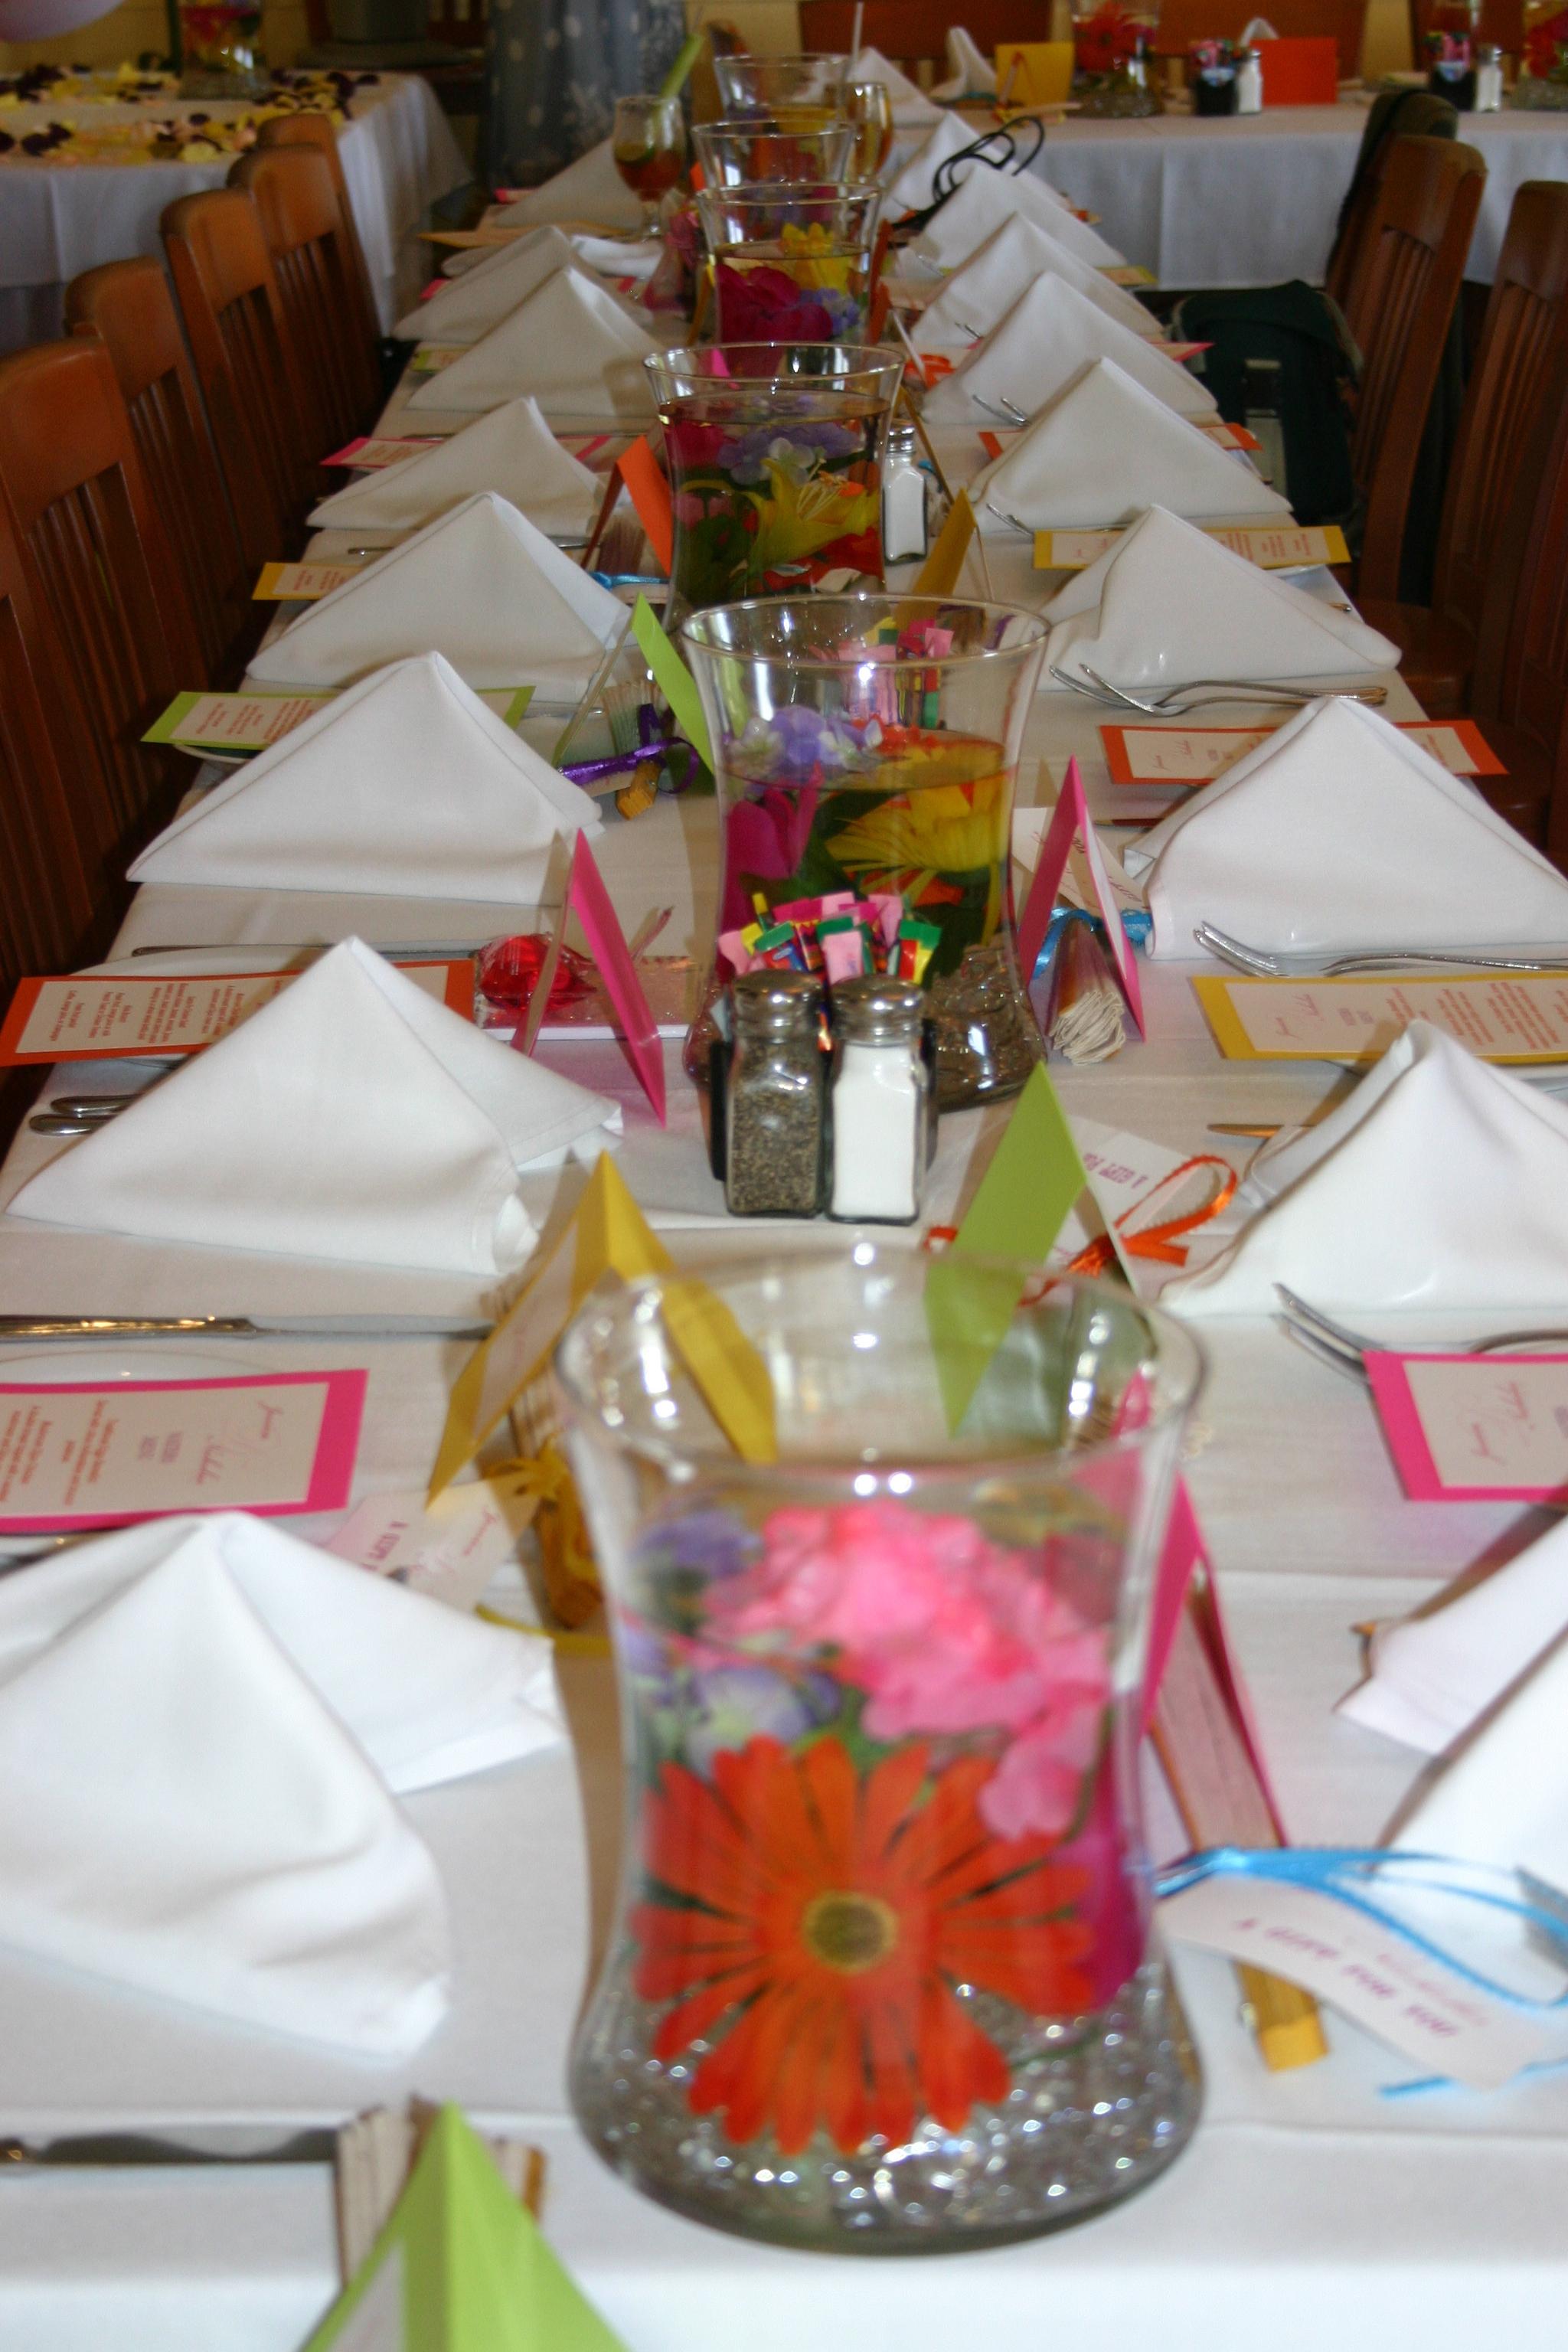 Flowers & Decor, Flowers, Silk, Submerged, Ceneterpiece